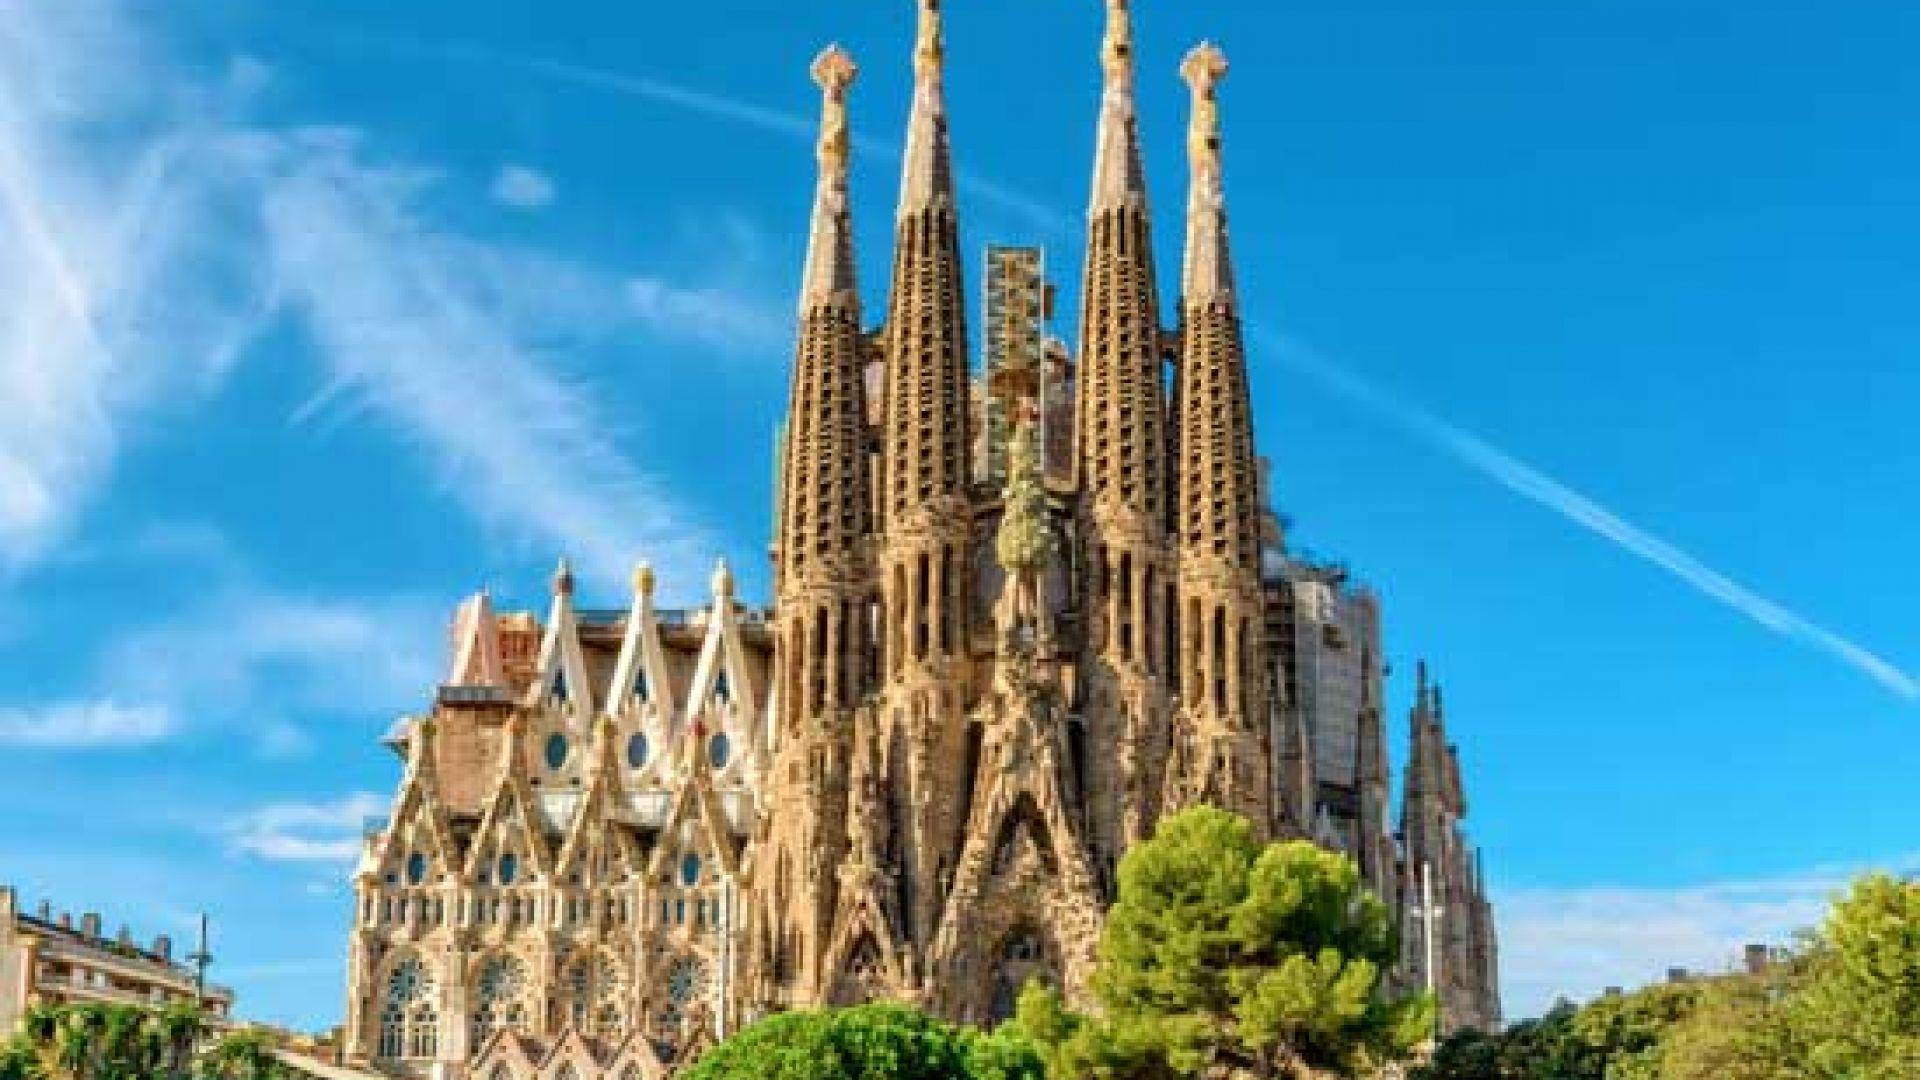 https://www.aparthotelsenator.com/resources/img/imgTxt/aparthotel-senator-barcelona-hotel-hotel-inferior-nova-web-4_25_108_1060.jpg